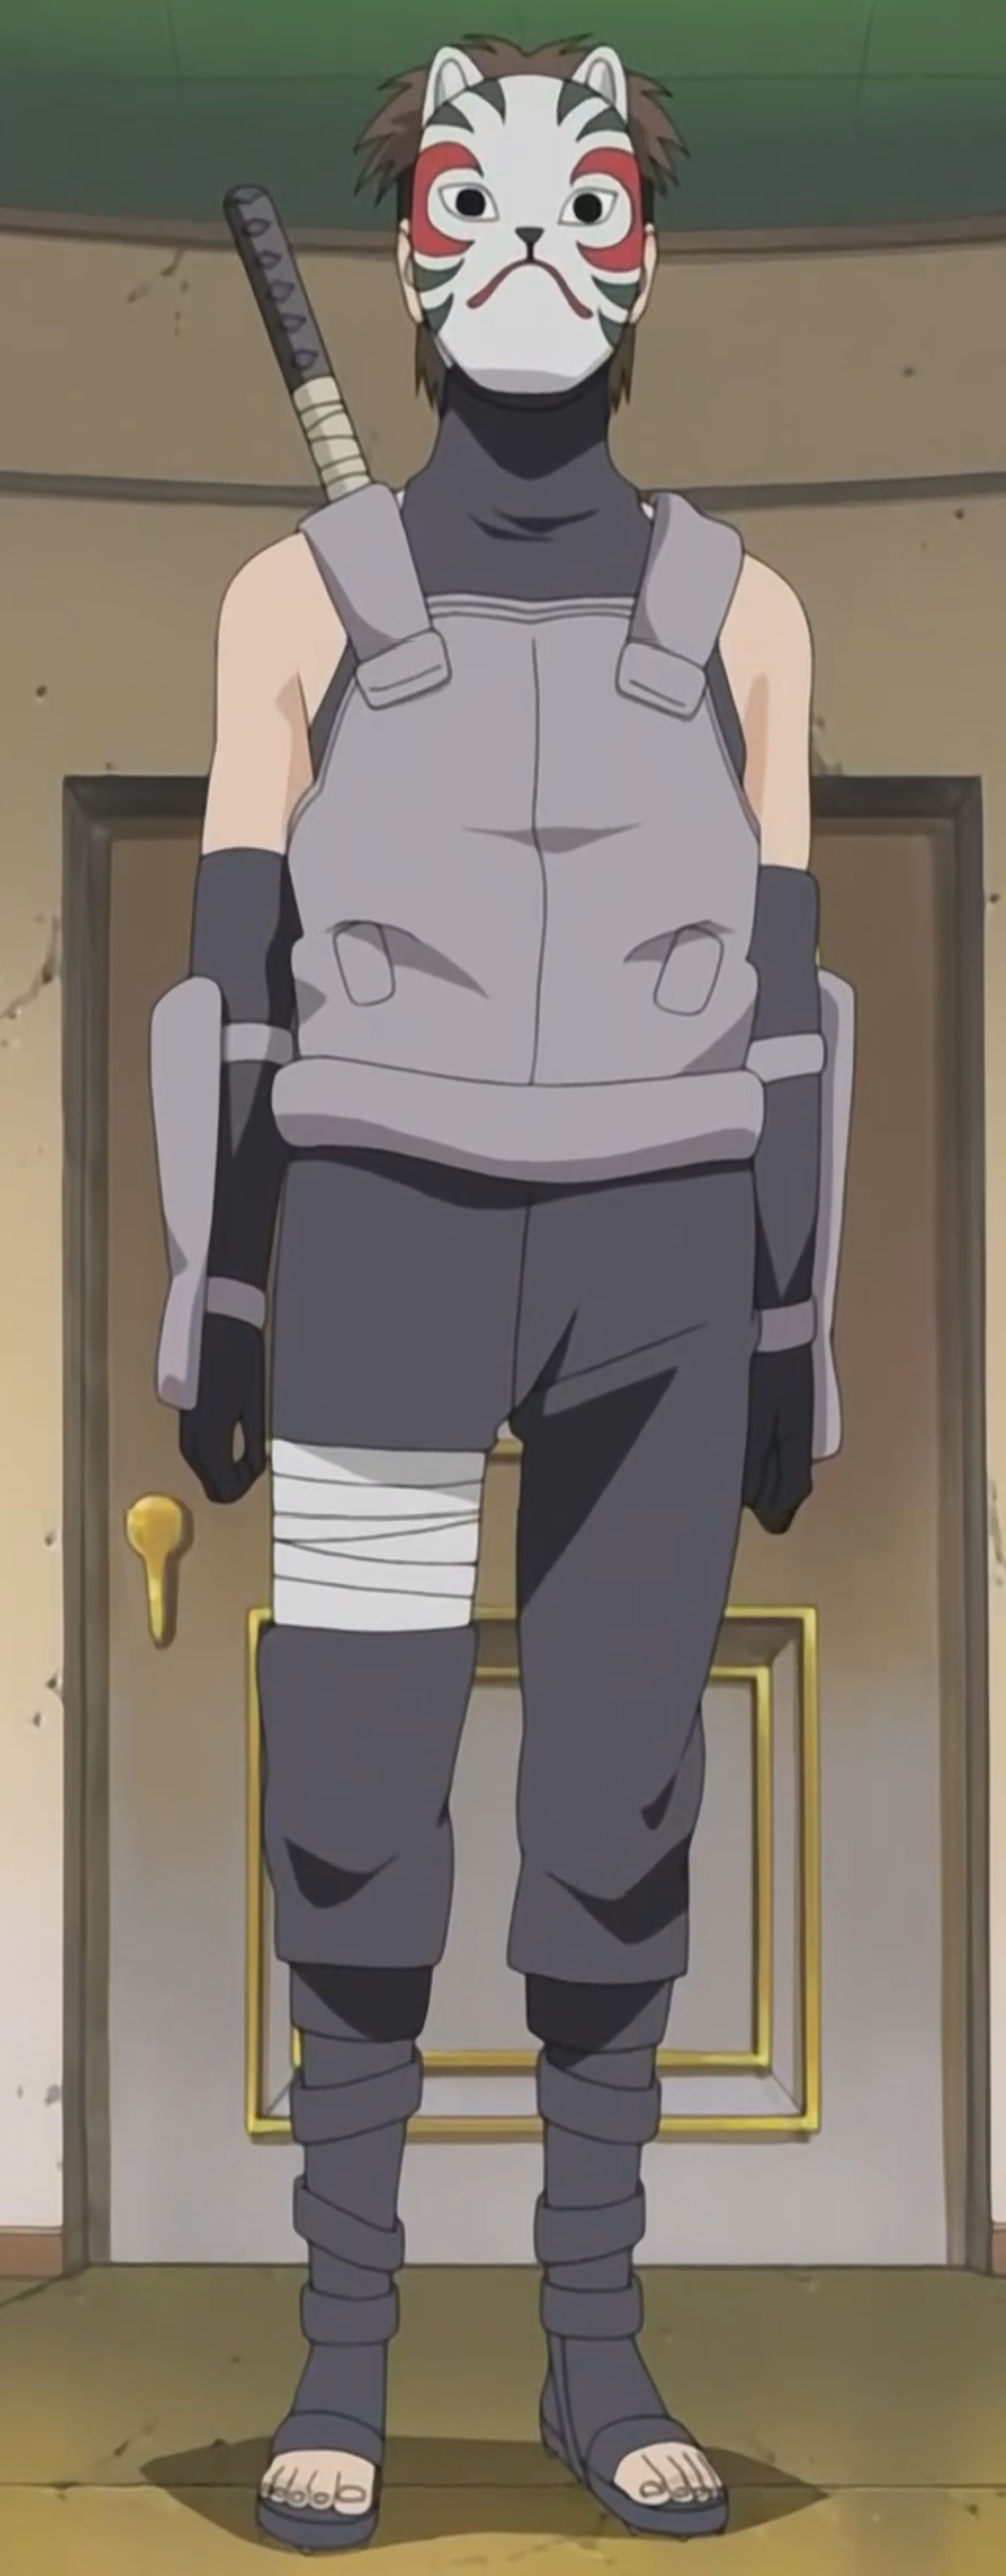 Naruto As A Anbu Image - Yamato Anbu Un...